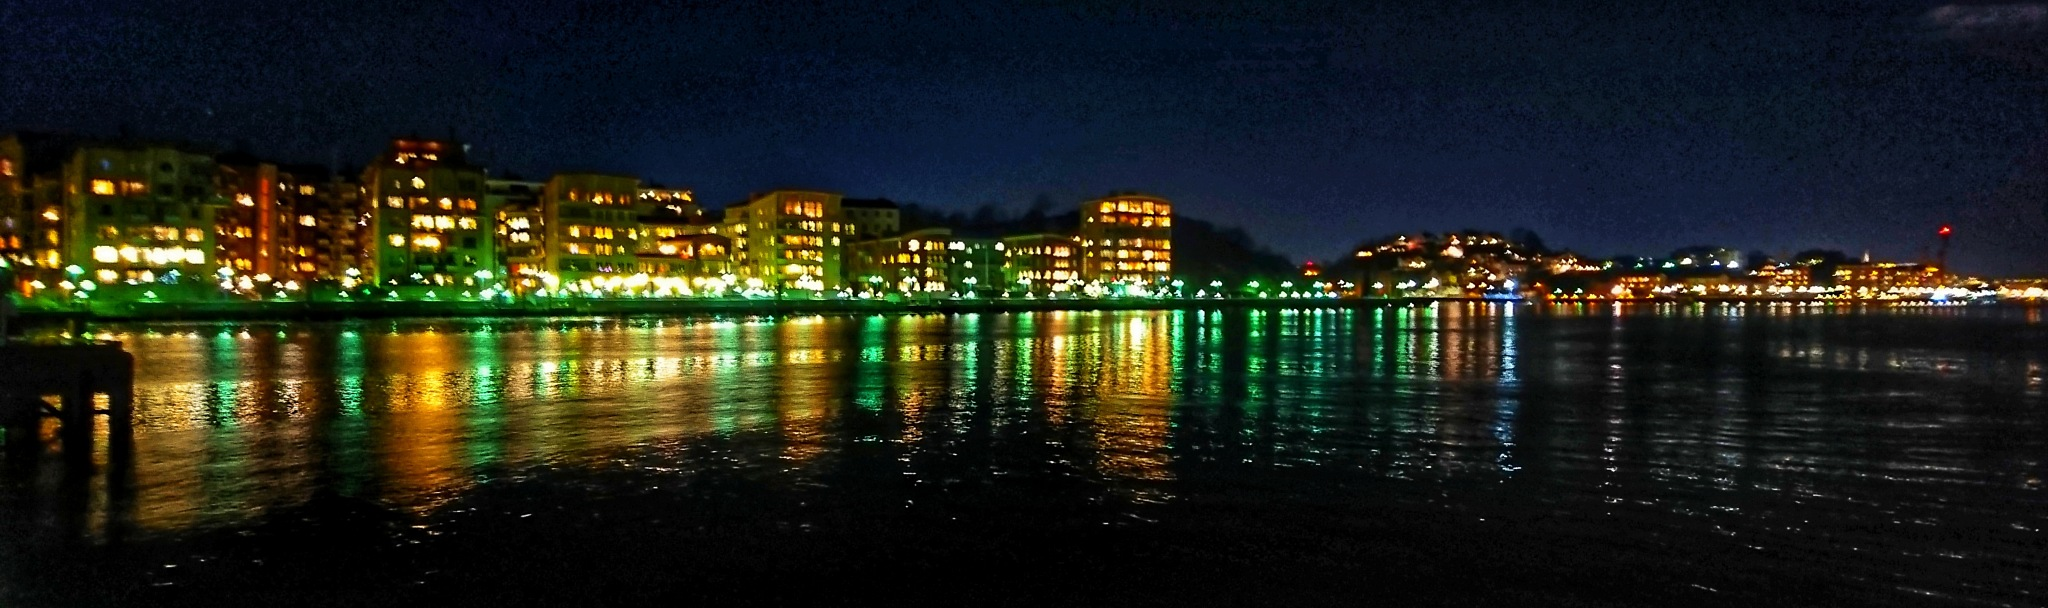 Eriksberg by night  by Krister Honkonen